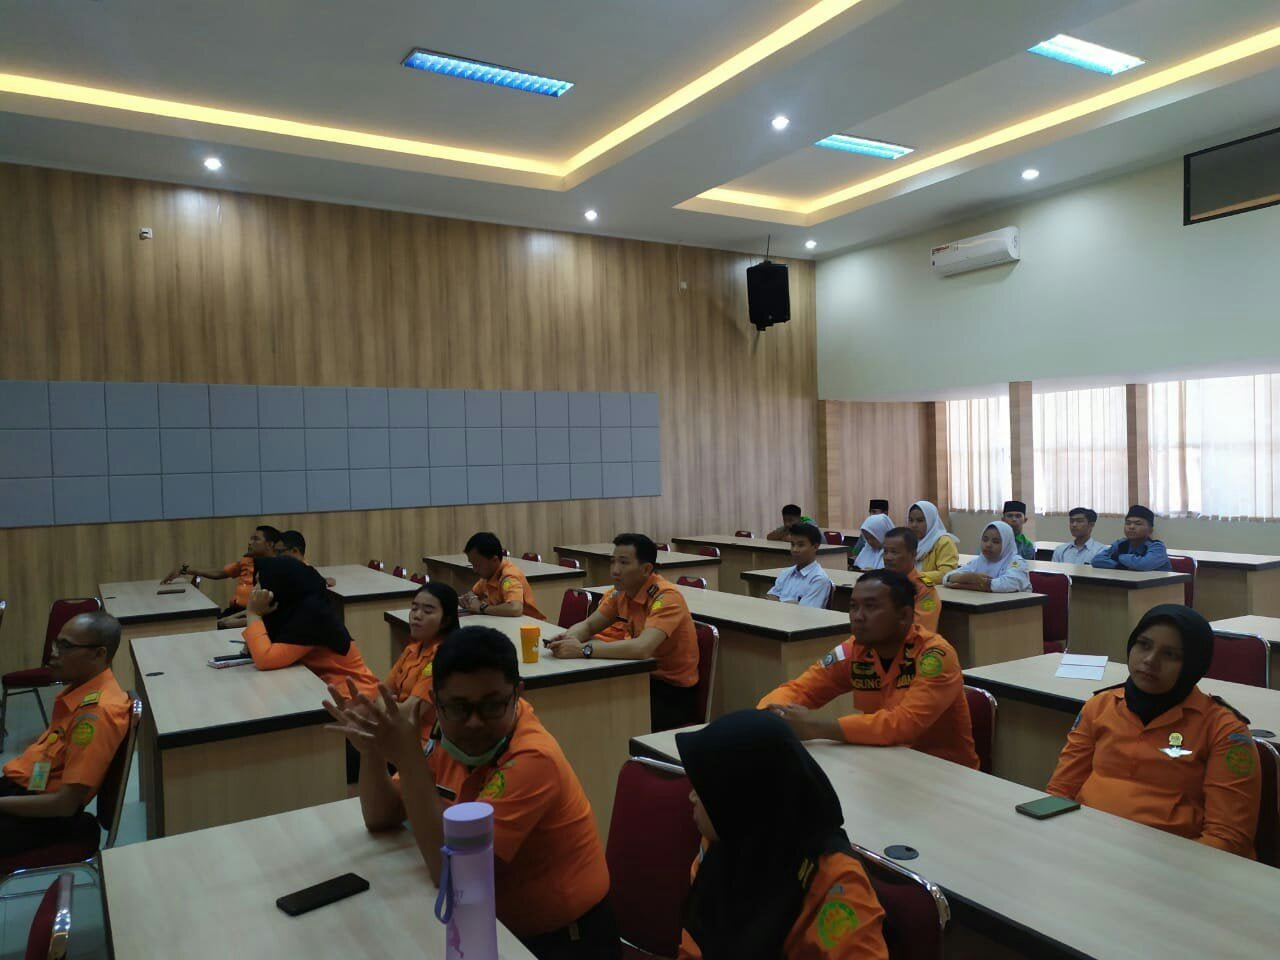 Kantor SAR Bandung Gelar Sosialisasi COVID 19 235